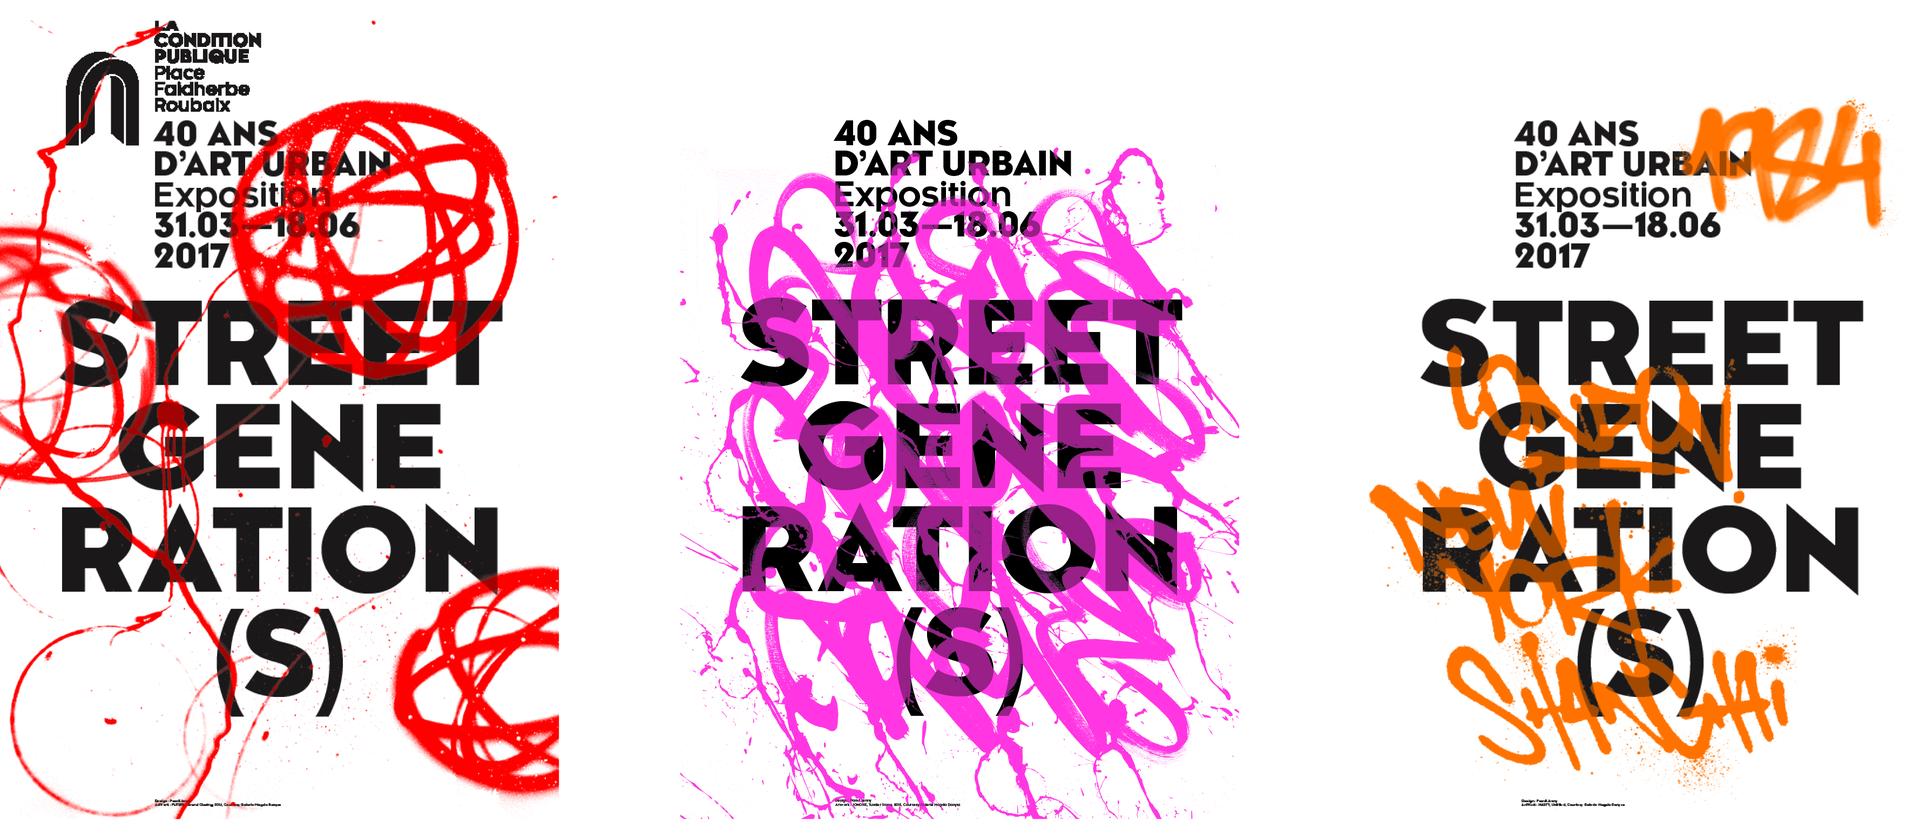 street generation(s) : 40 ans d'art urbain a roubaix - slave 2.0